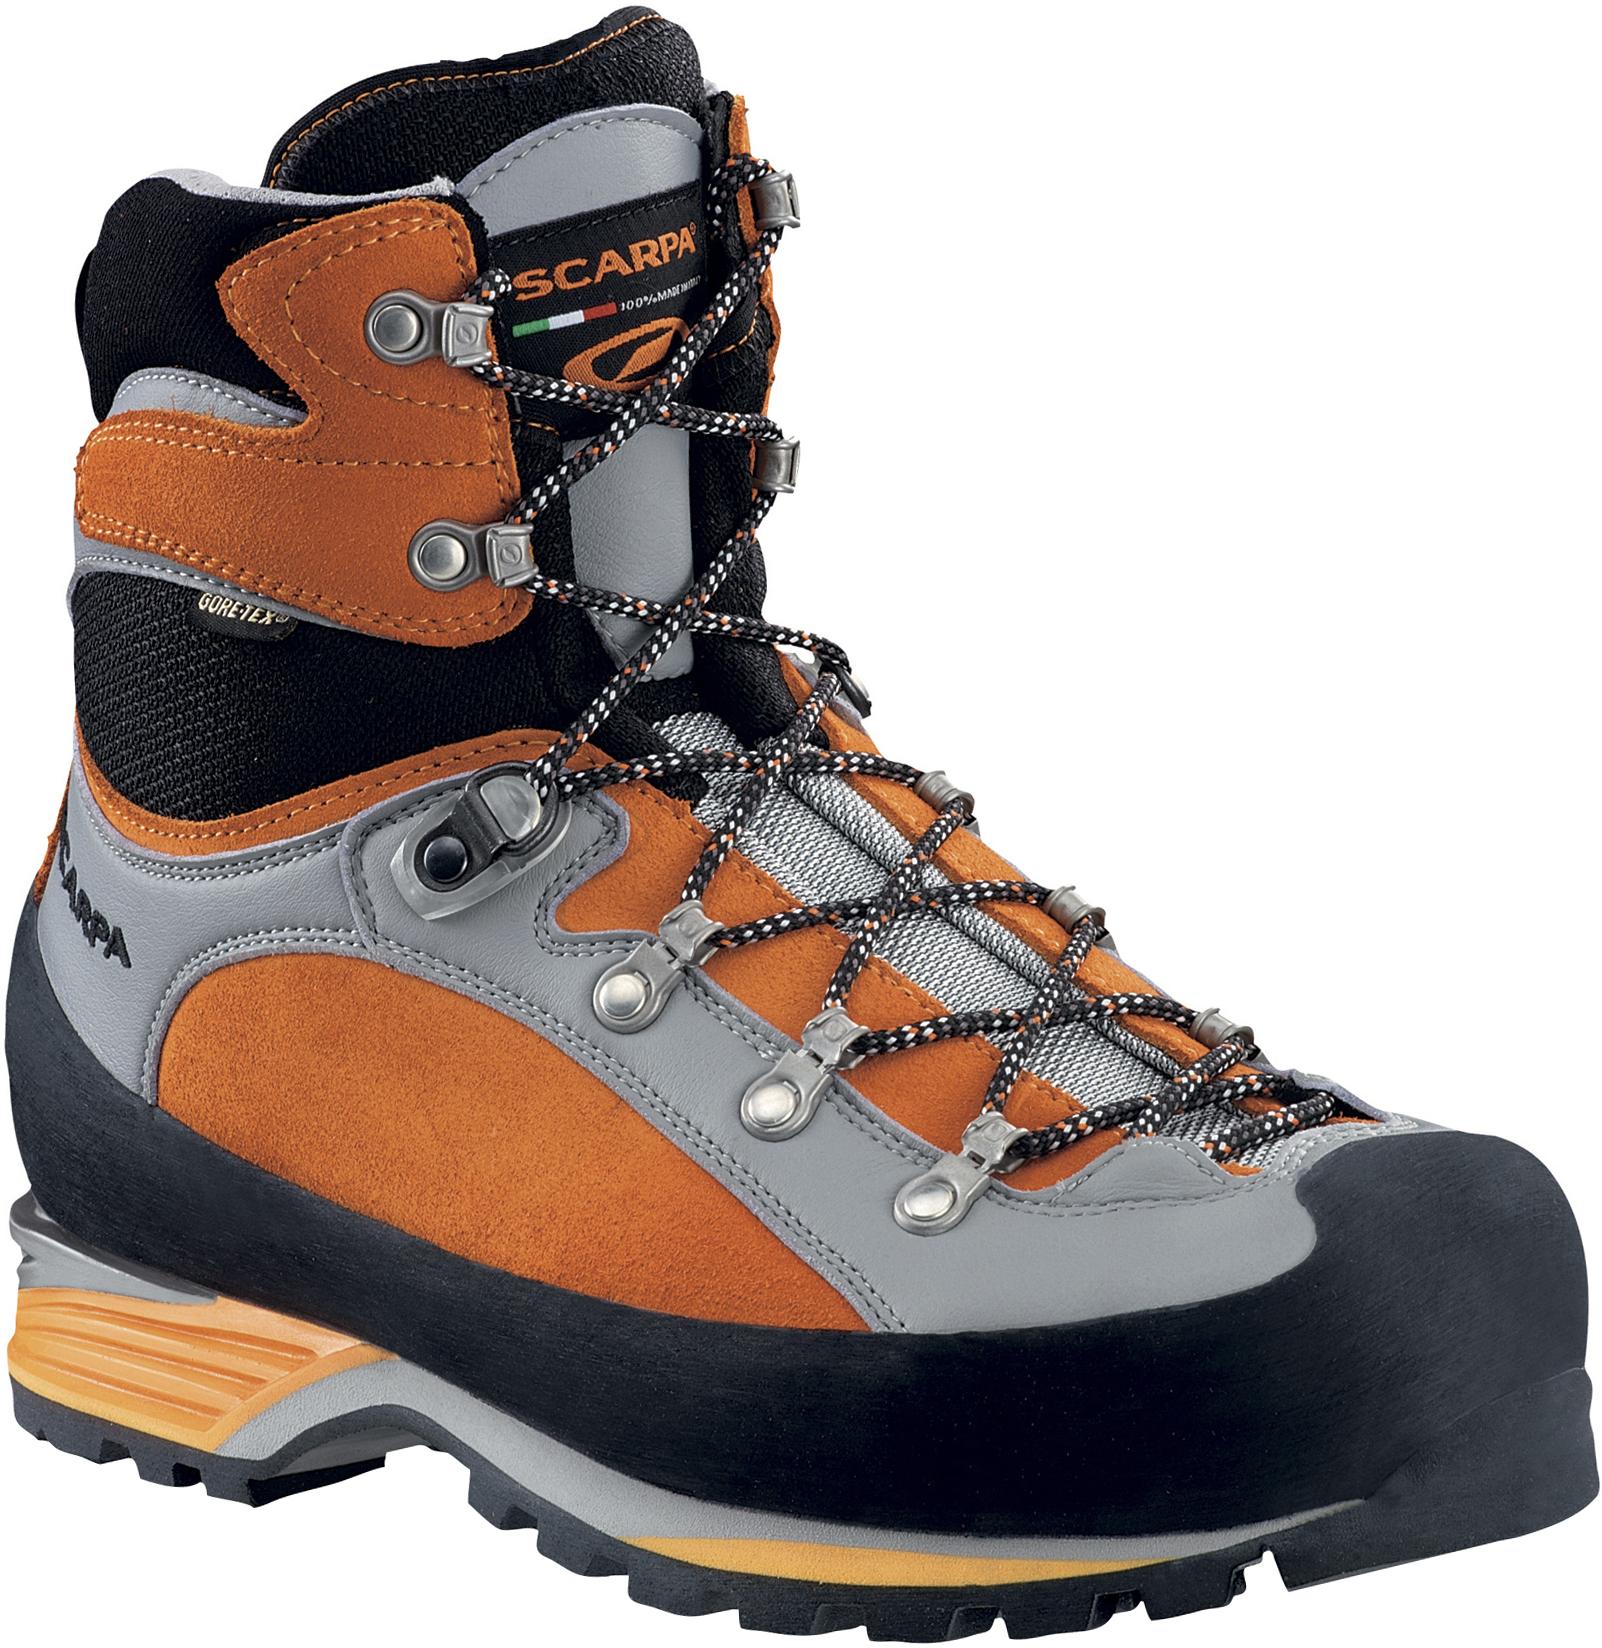 Scarpa Triolet Pro GTX Mountaineering